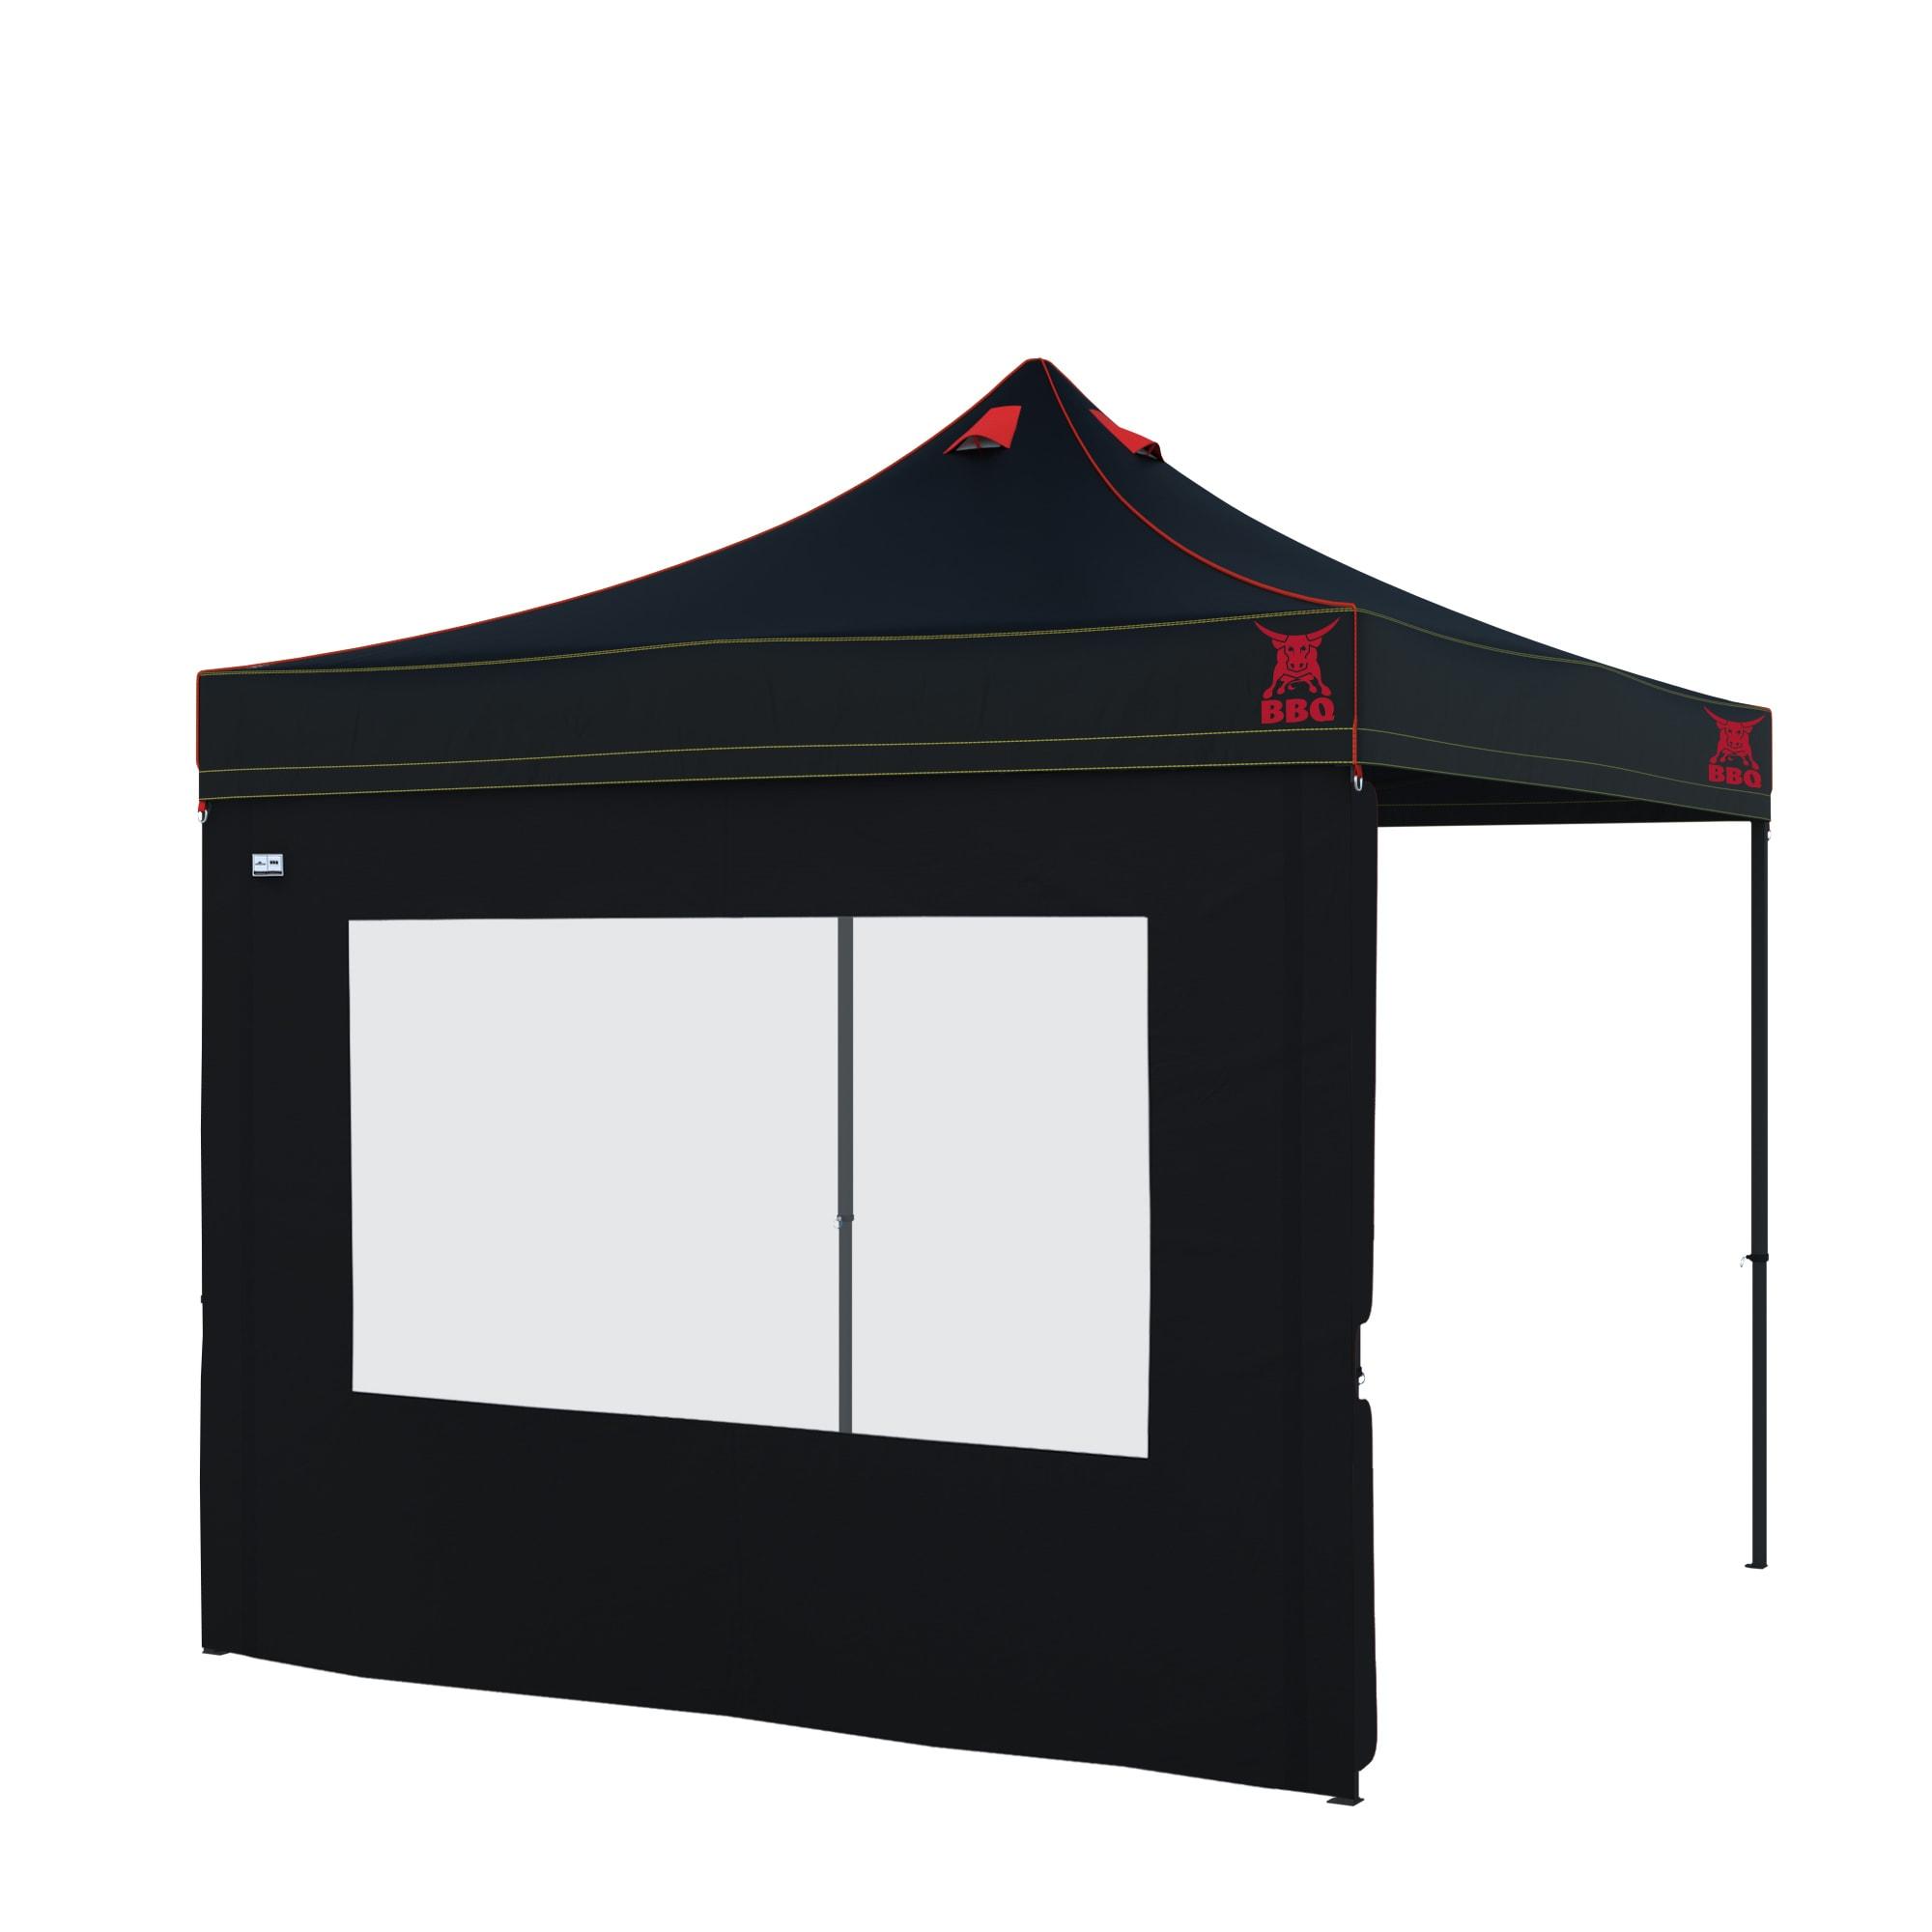 partyzelt pavillon pavillion gartenzelt 3x3m gartenpavillon wasserdicht pro30 ebay. Black Bedroom Furniture Sets. Home Design Ideas